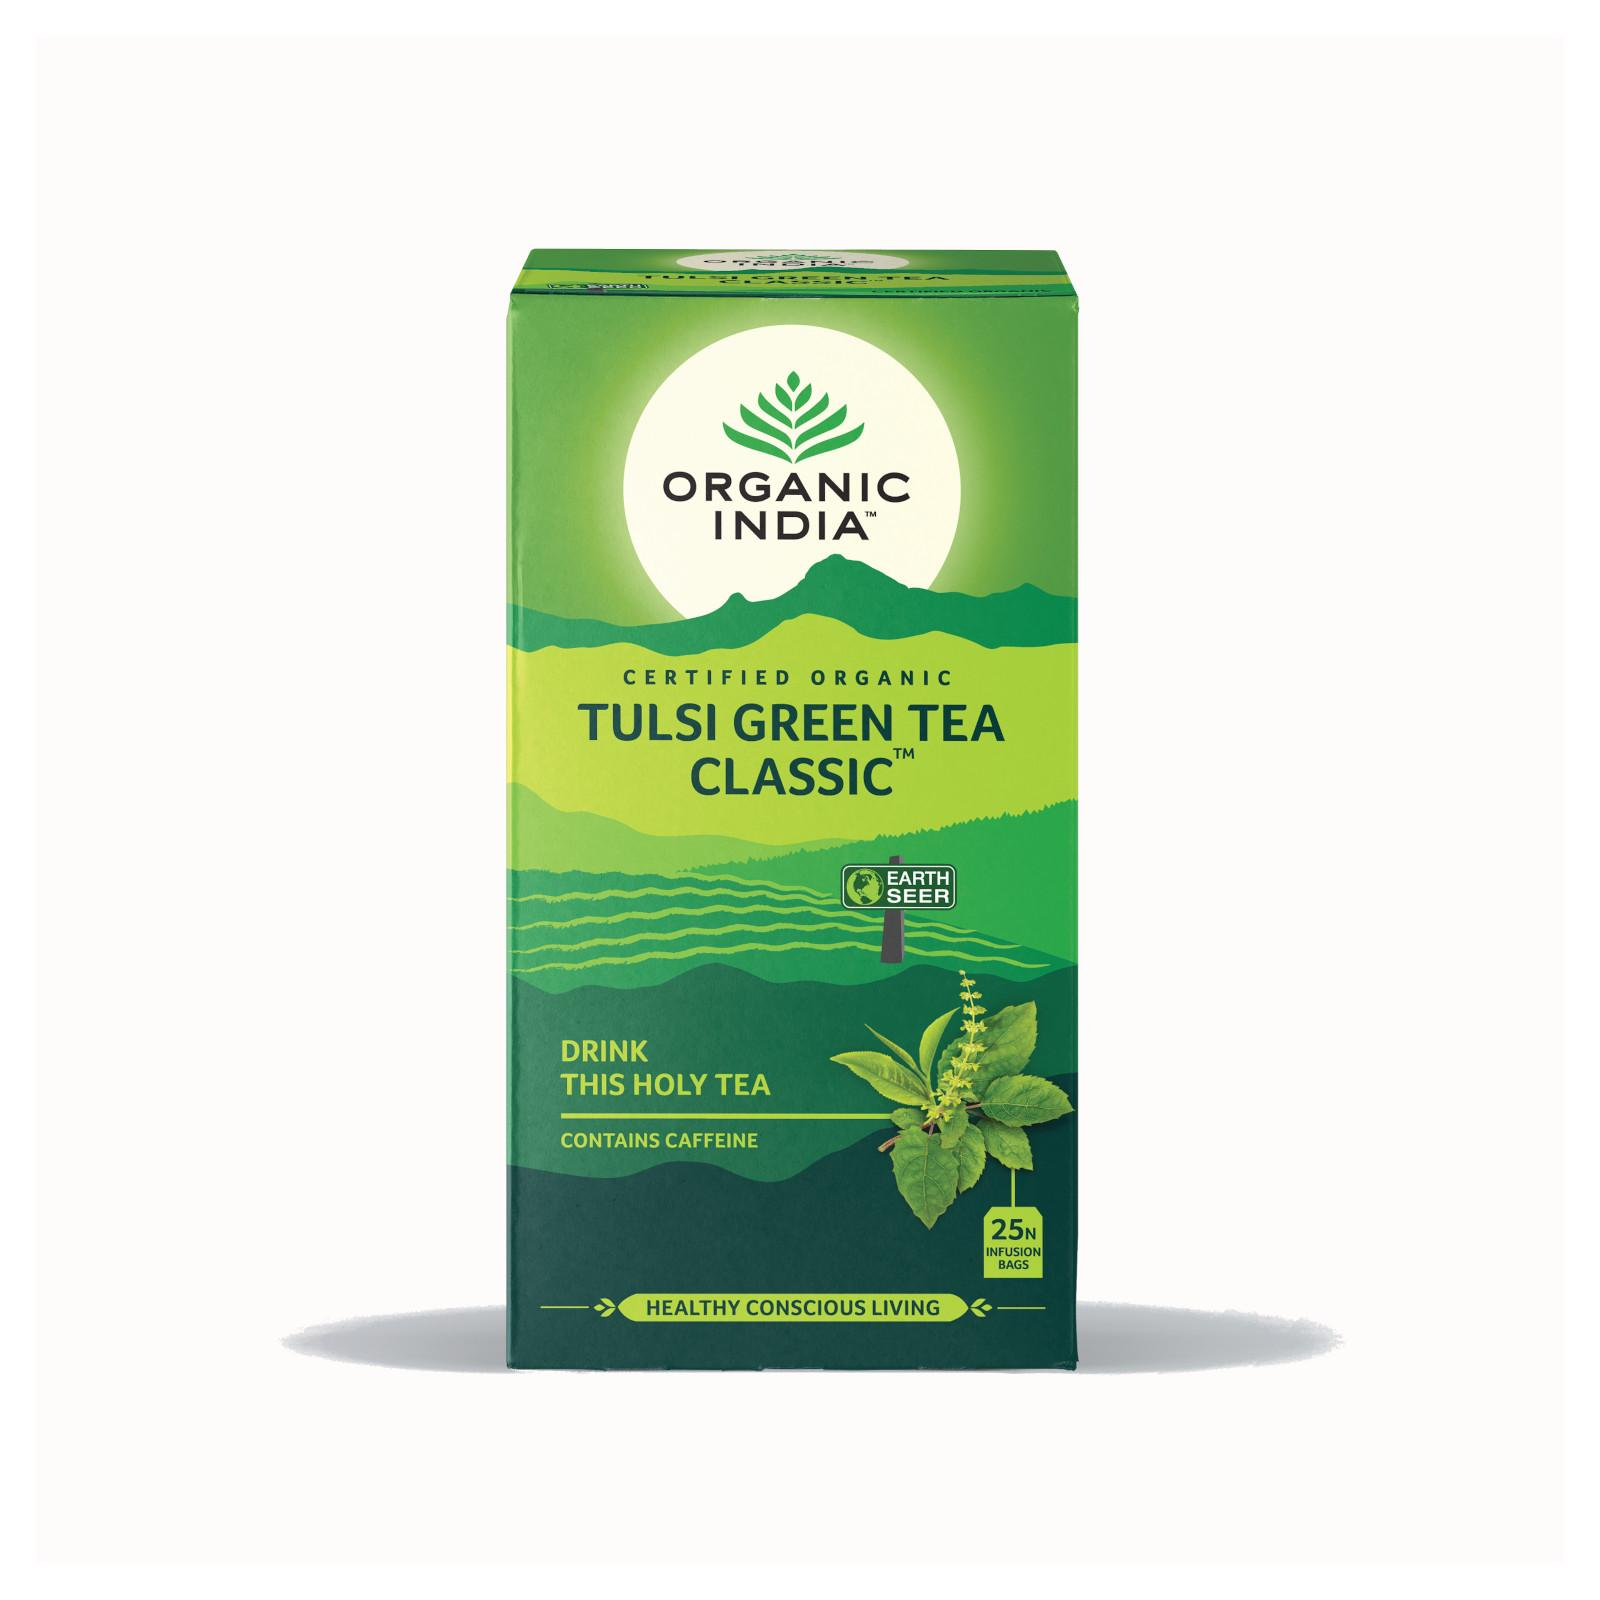 Organic India Čaj Tulsi Green, porcovaný 25 ks, 43,5 g